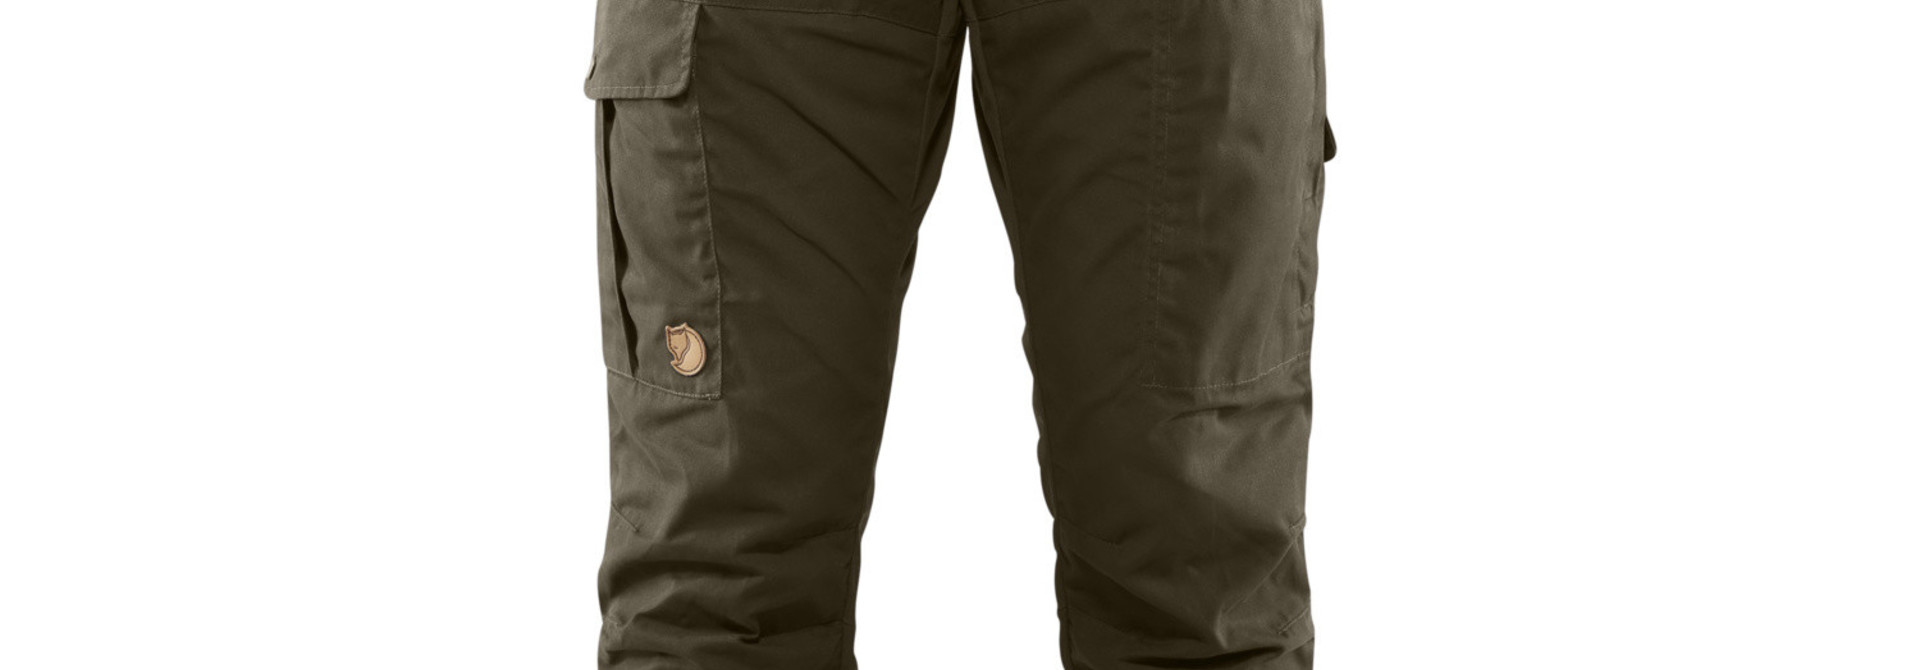 Fjällraven Karl Pro Winter Trousers M Dark Olive